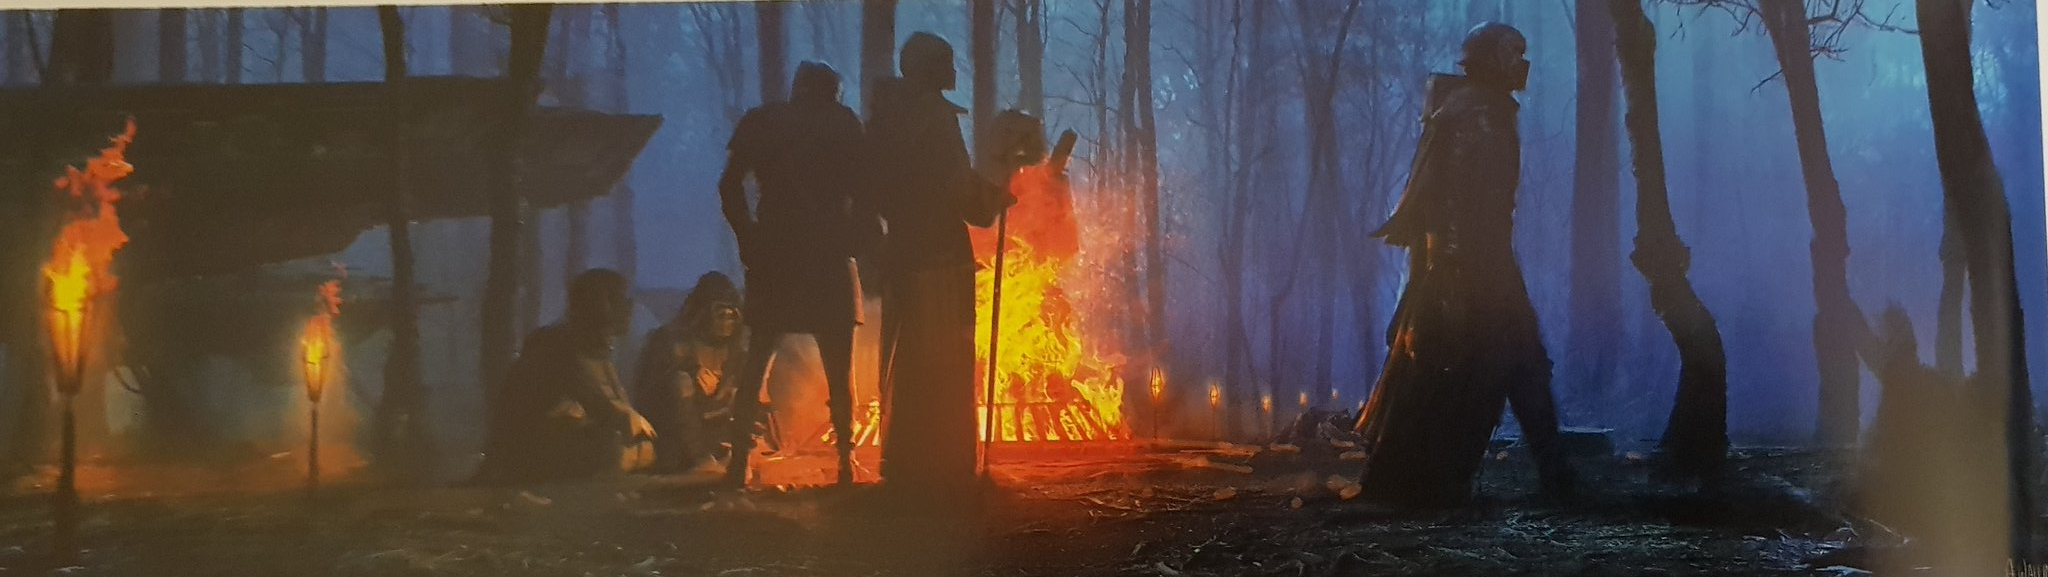 Star Wars 9 - Kylo Ren na Mustafarze